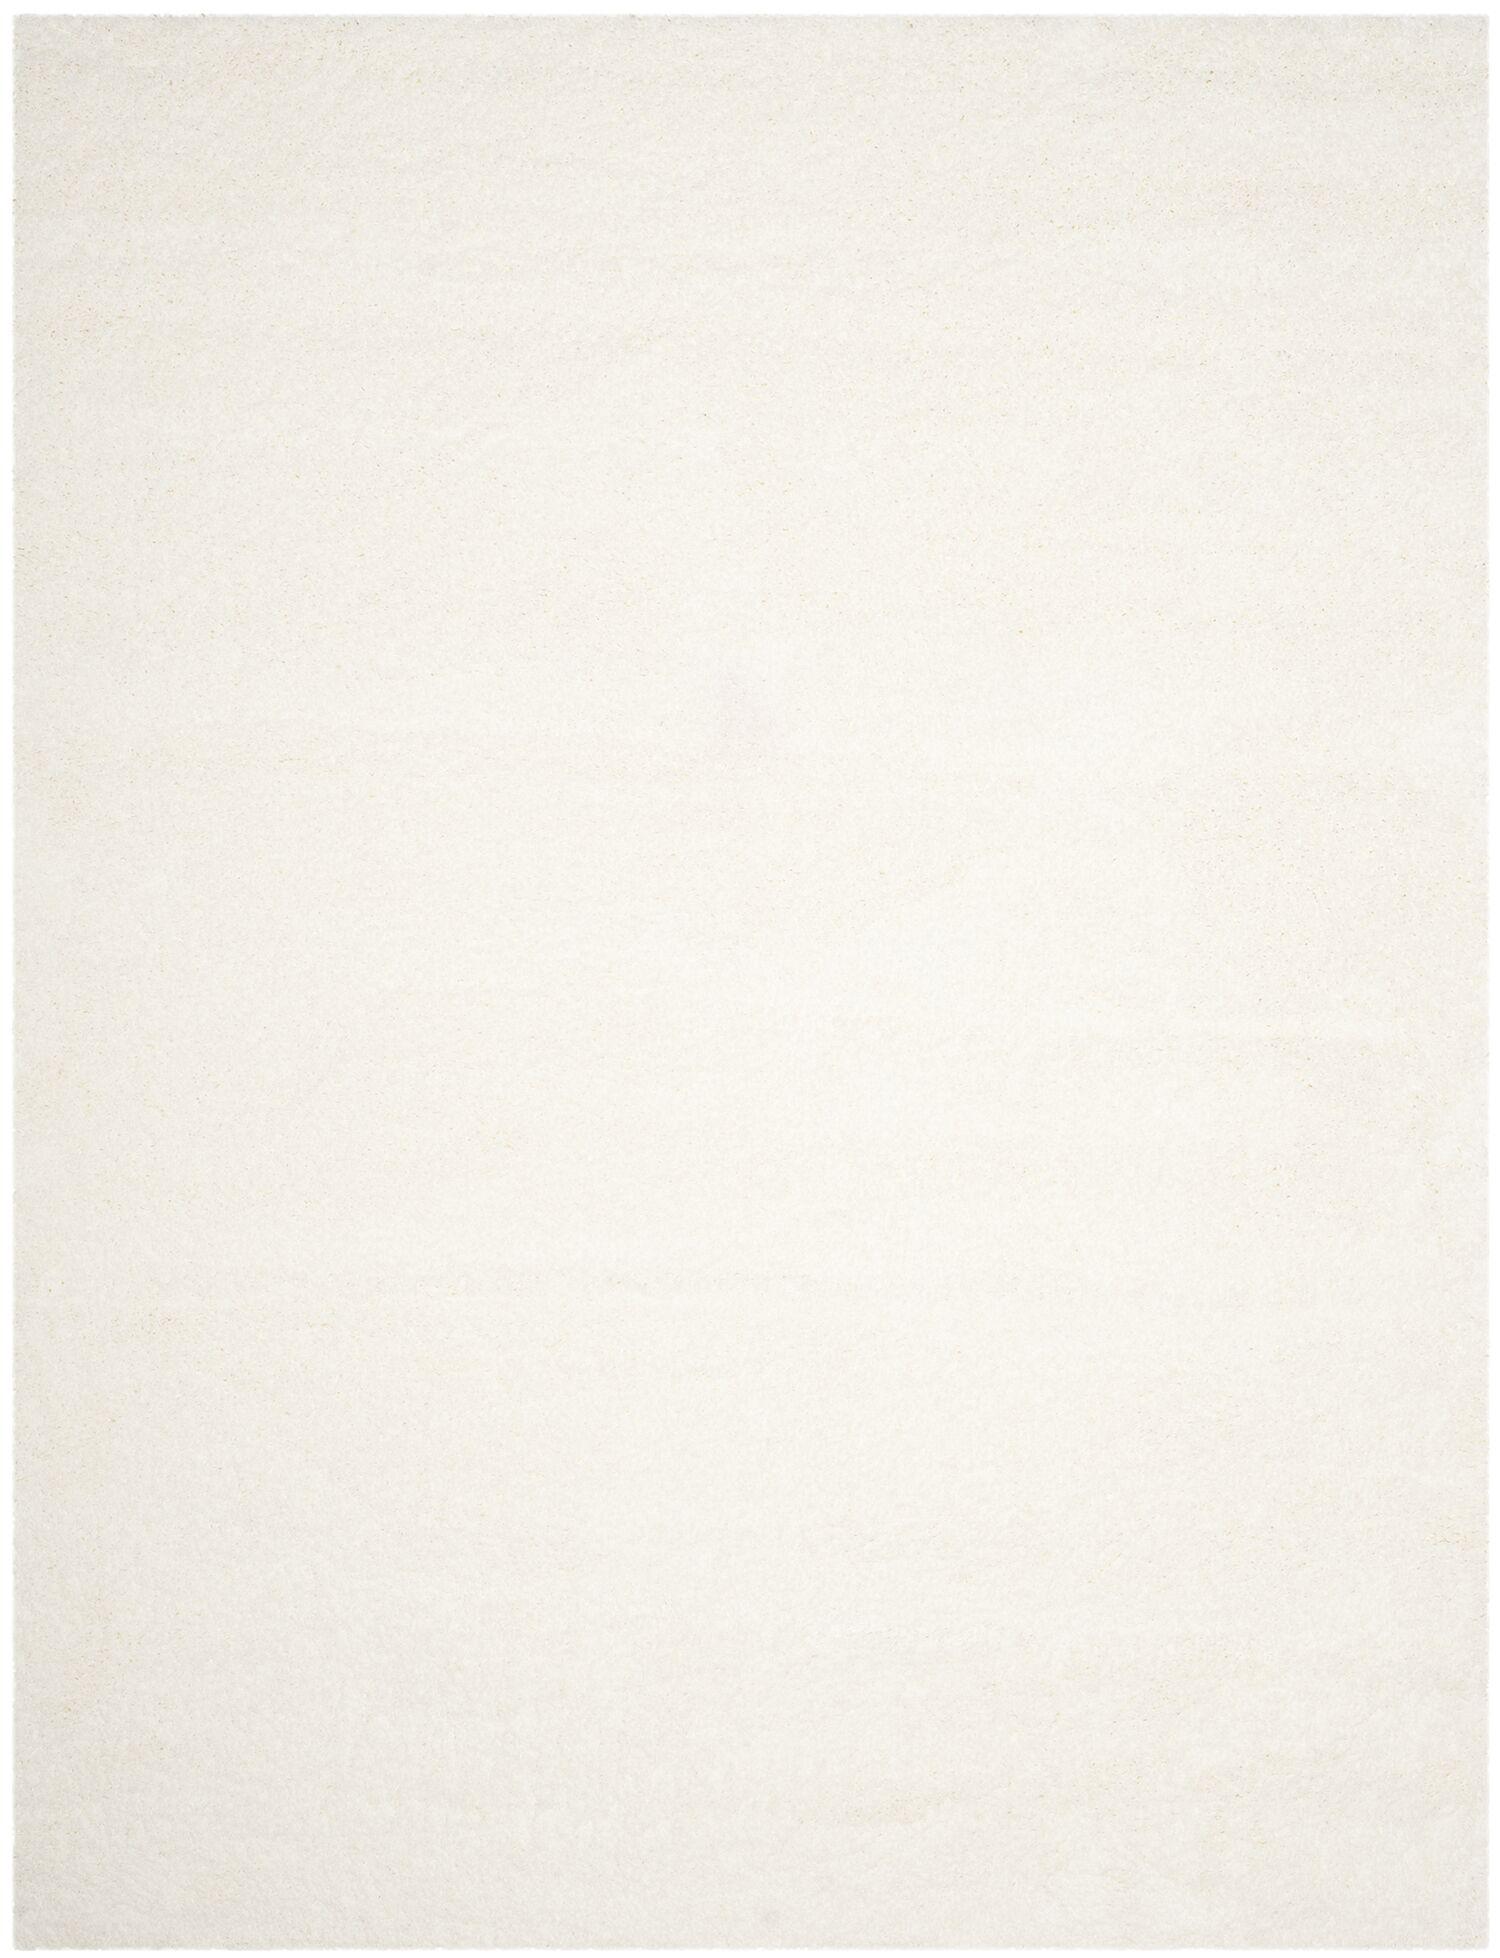 Brickner White Area Rug Rug Size: Rectangle 8' x 10'